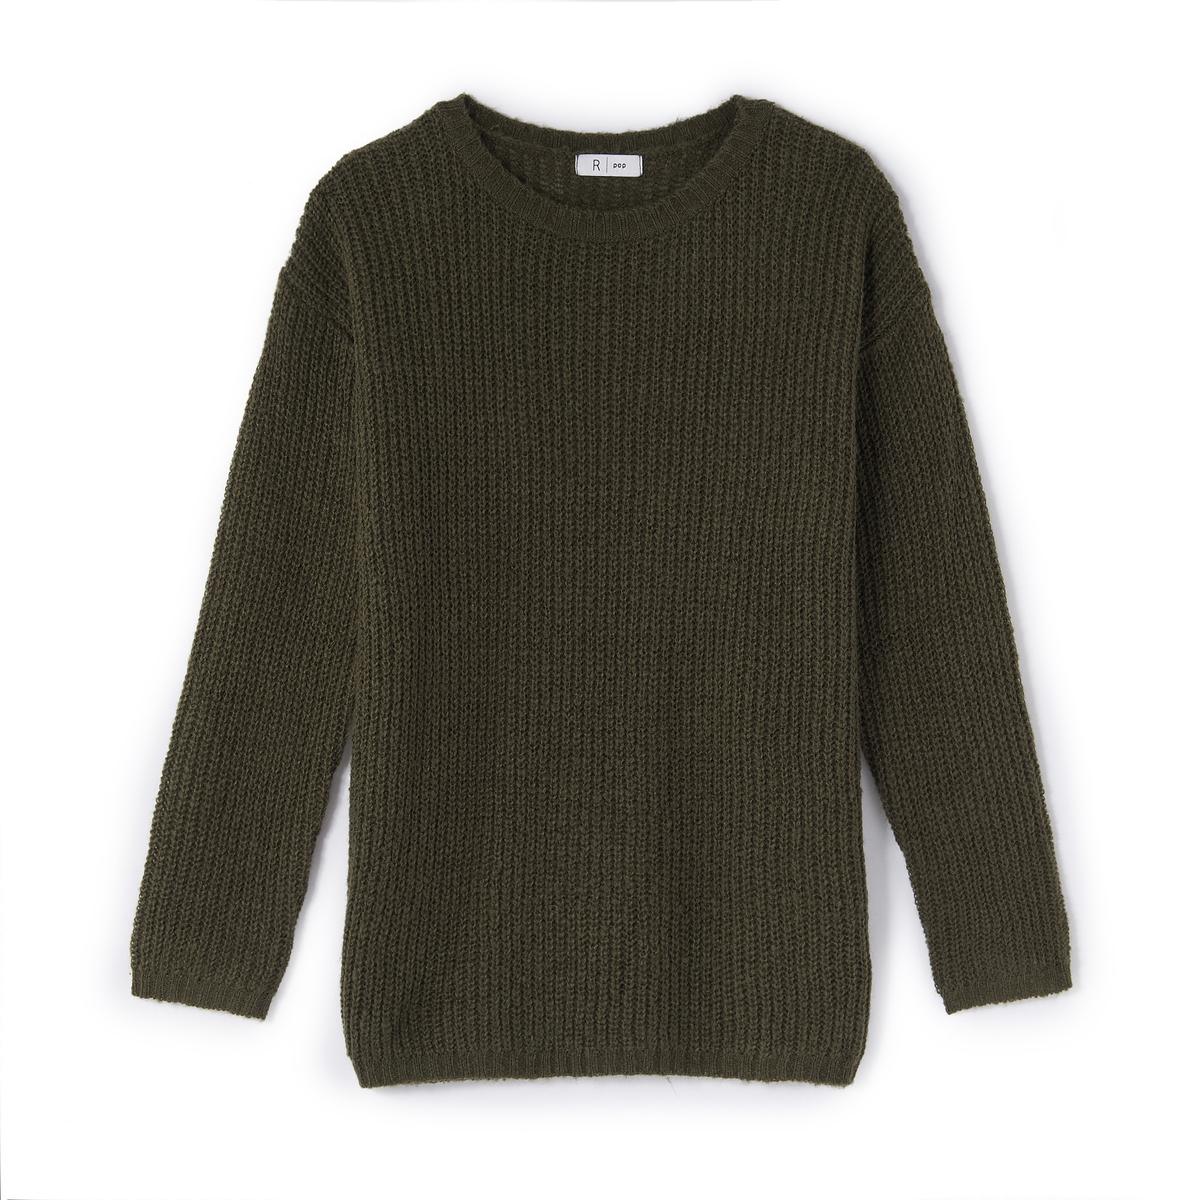 Пуловер свободного покроя из трикотажа под мохер, 10-16 лет